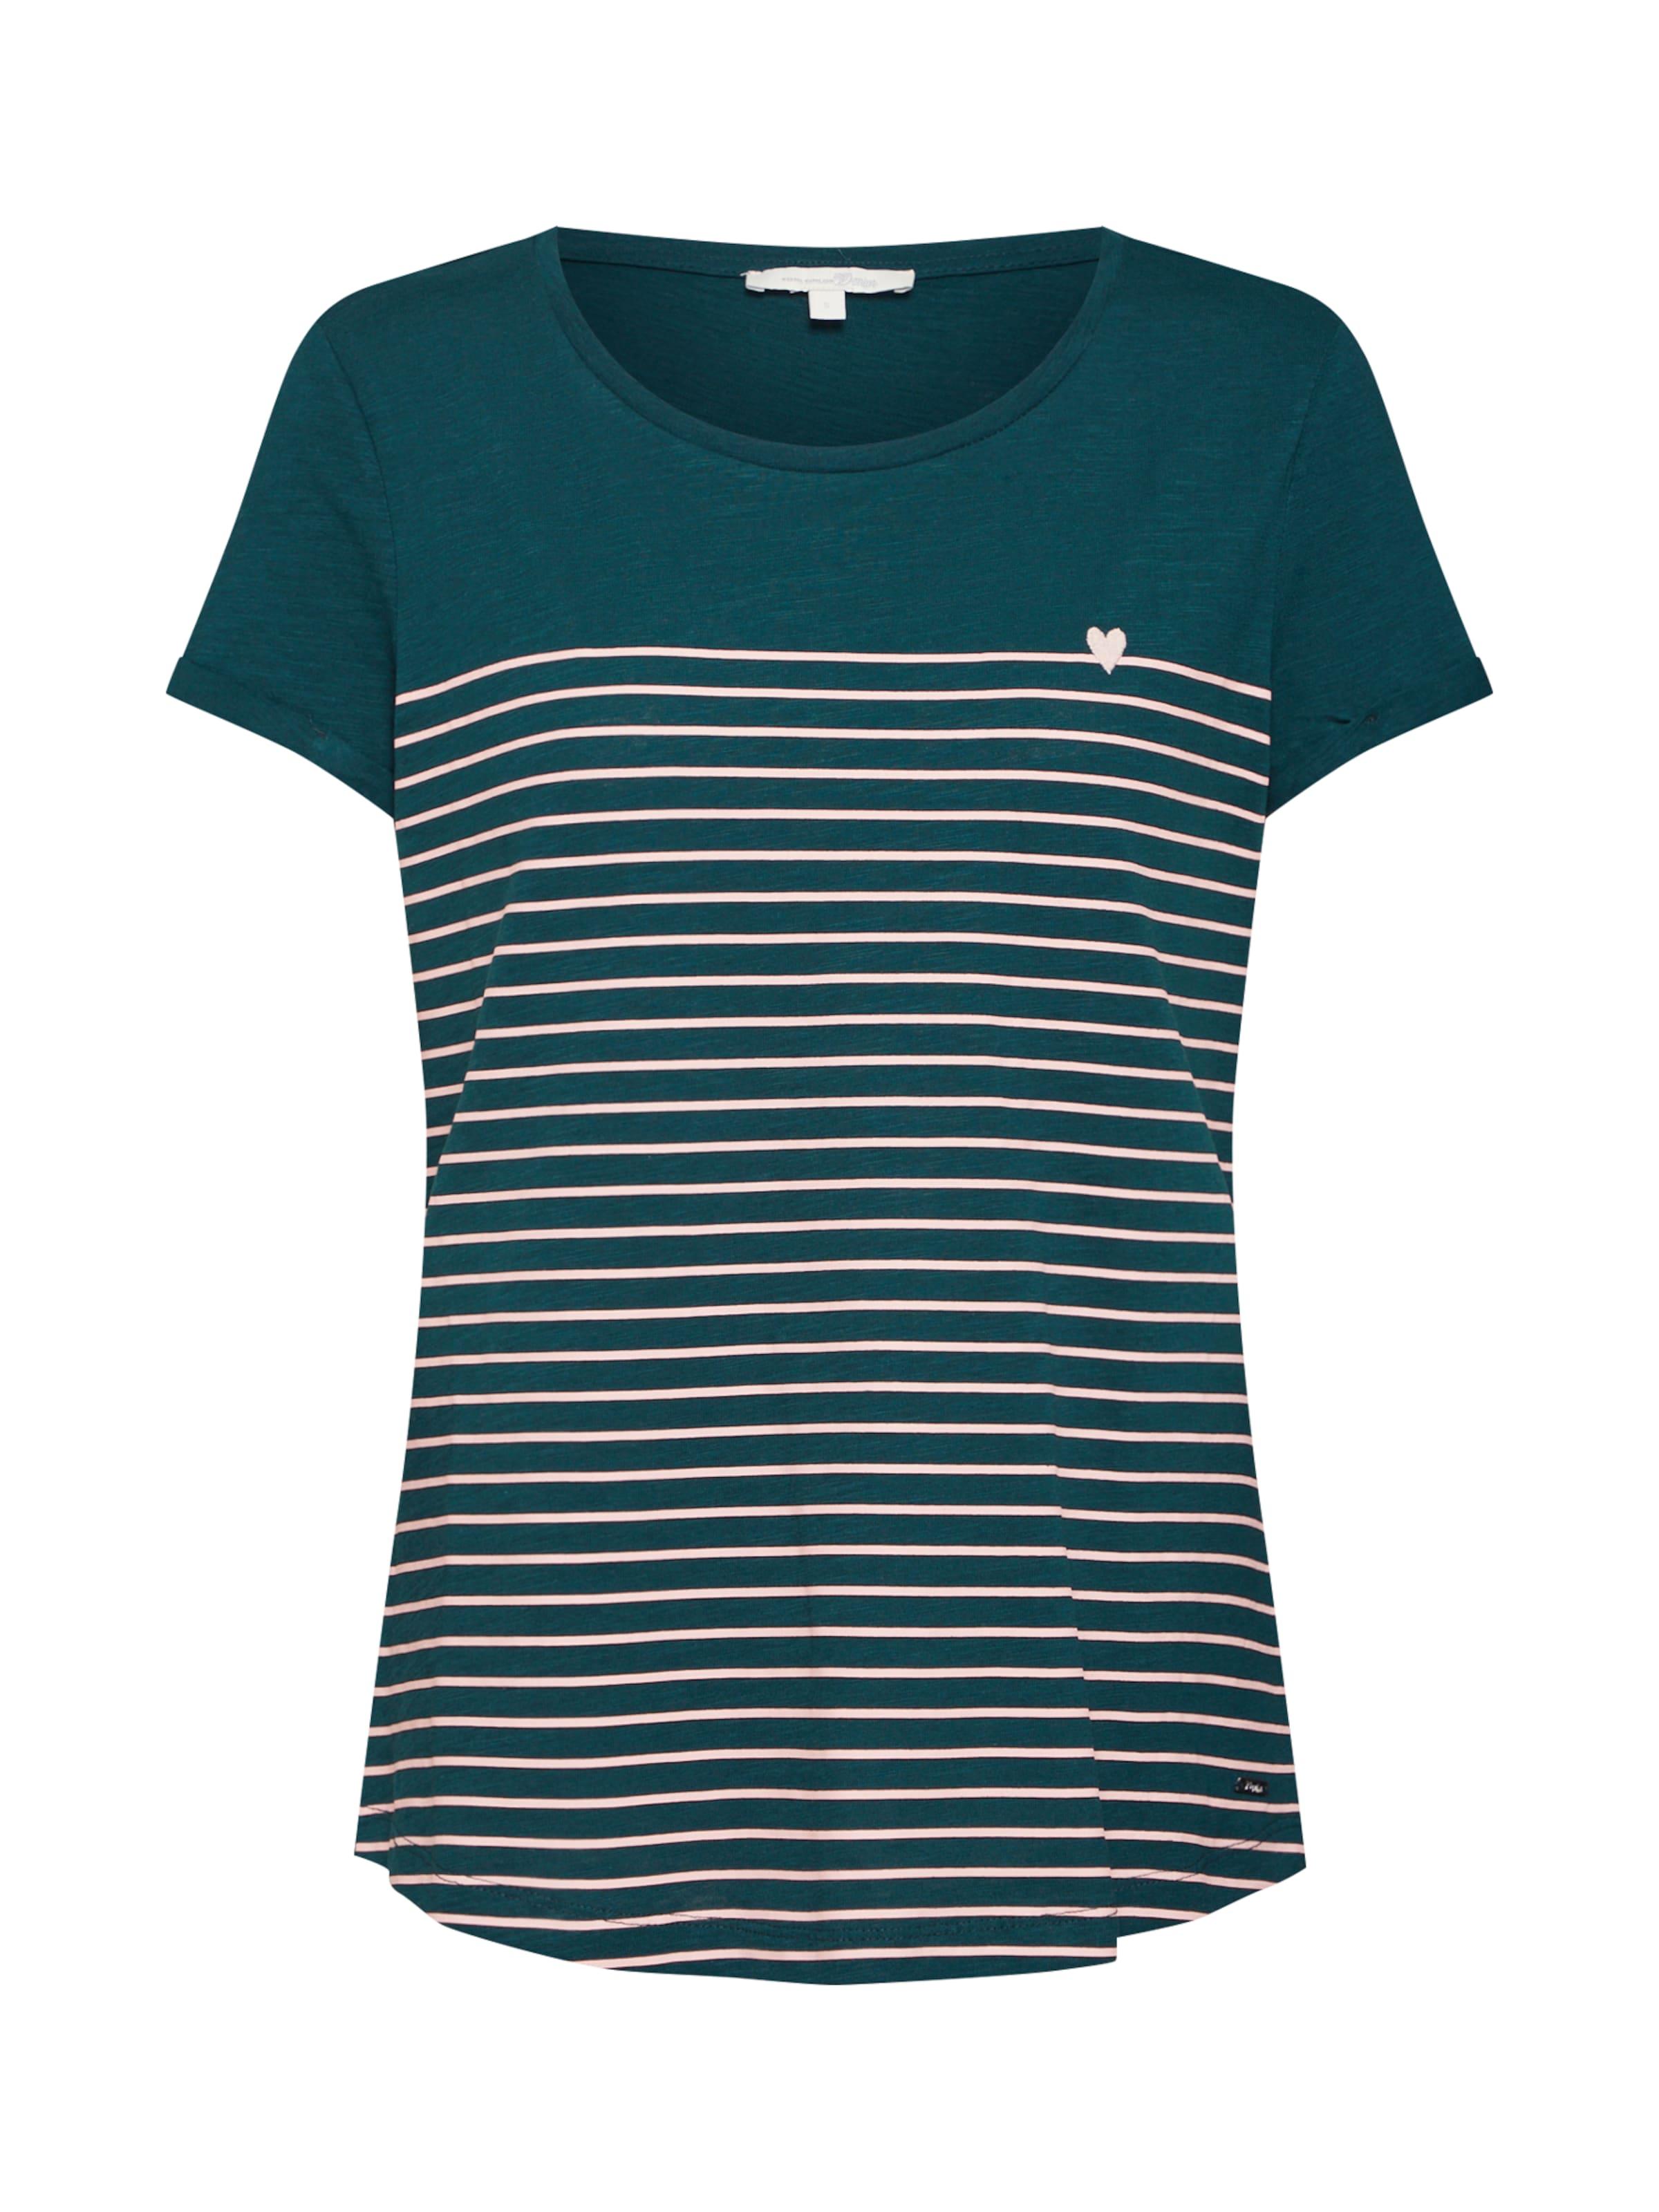 Shirt GrünRosa Tom In Denim Tailor shCQrtd